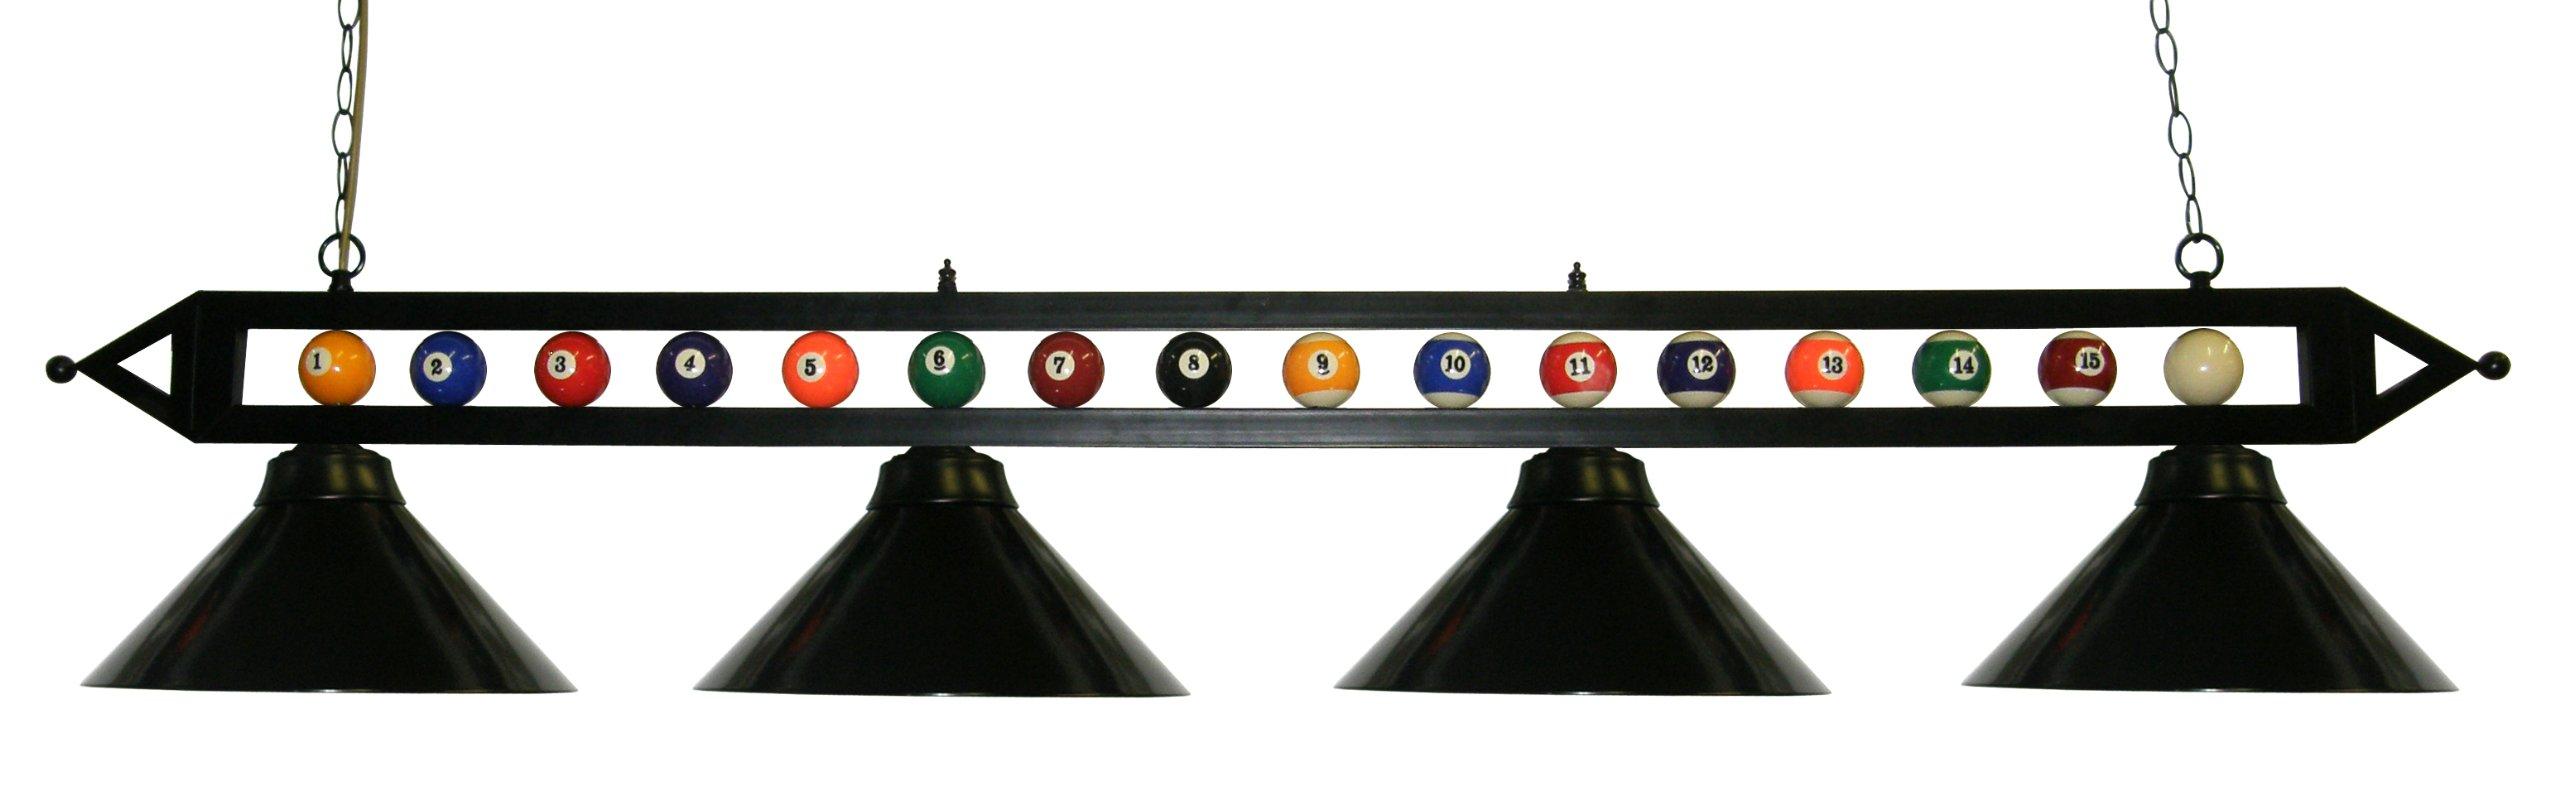 72'' Black Metal Ball Design Pool Table Light Billiard Lamp Choose Black, Red, Green Metal Shades or White Glass (Black Metal Shades)